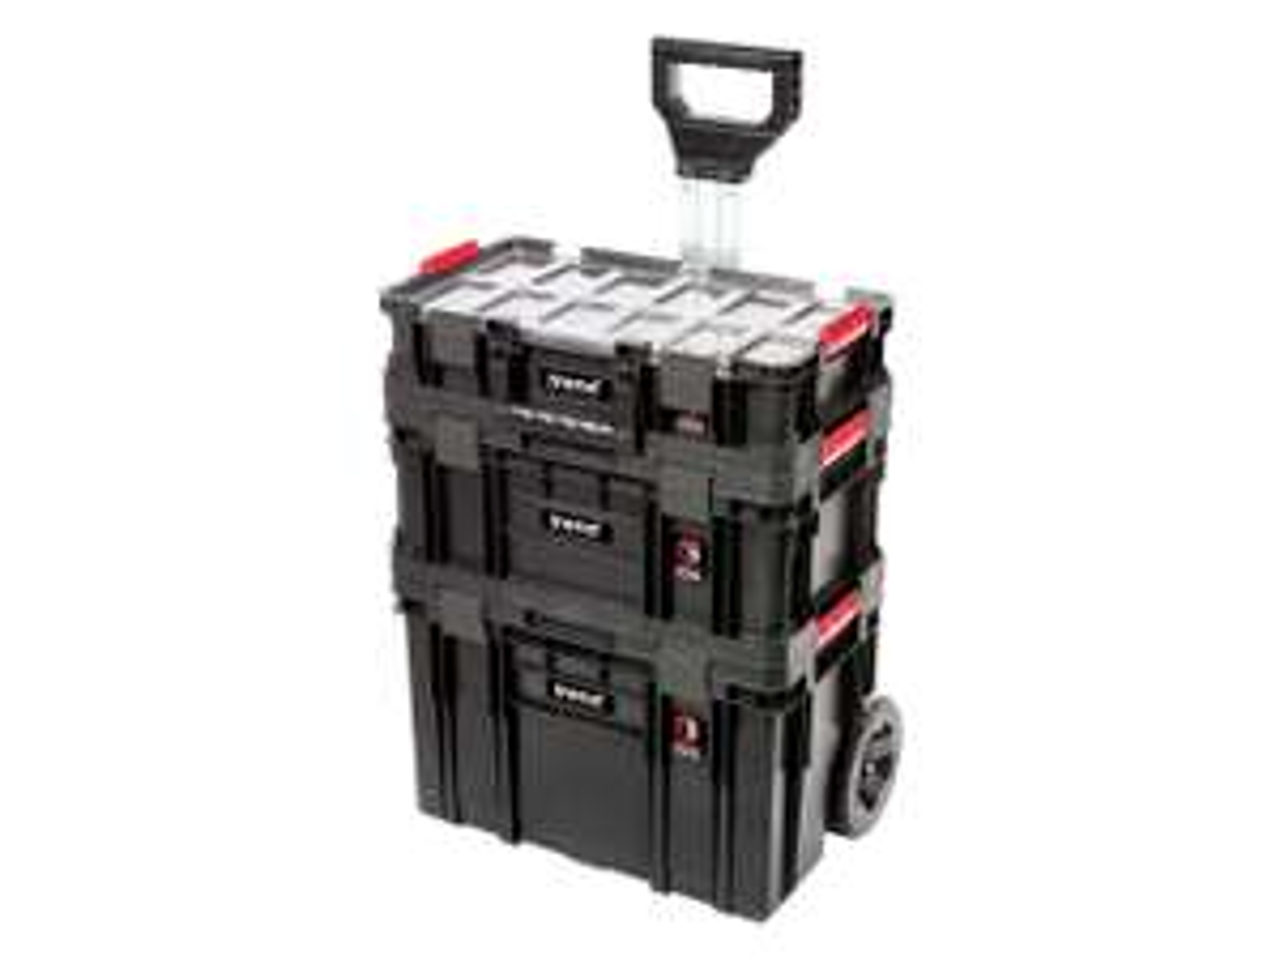 Trend Modular Compact Cart Set (3pc) £89 at FFX